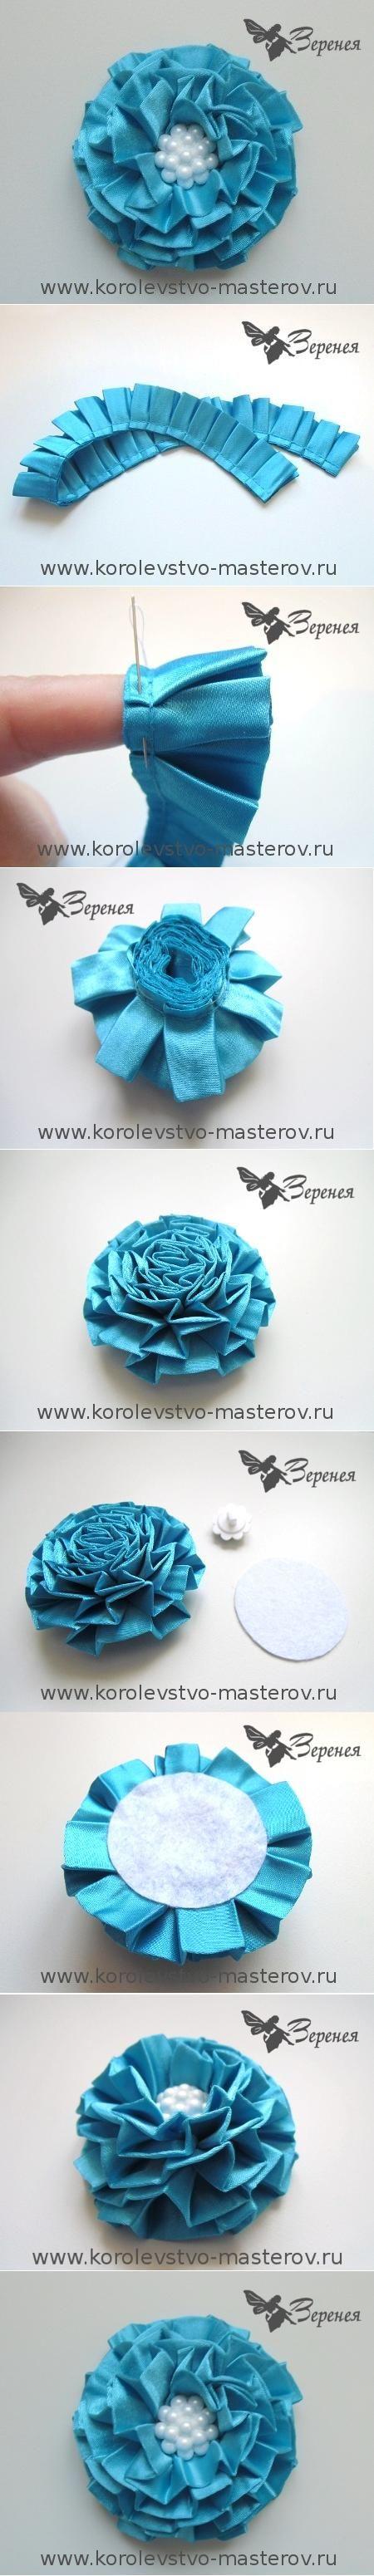 DIY Lace Ruff Flower